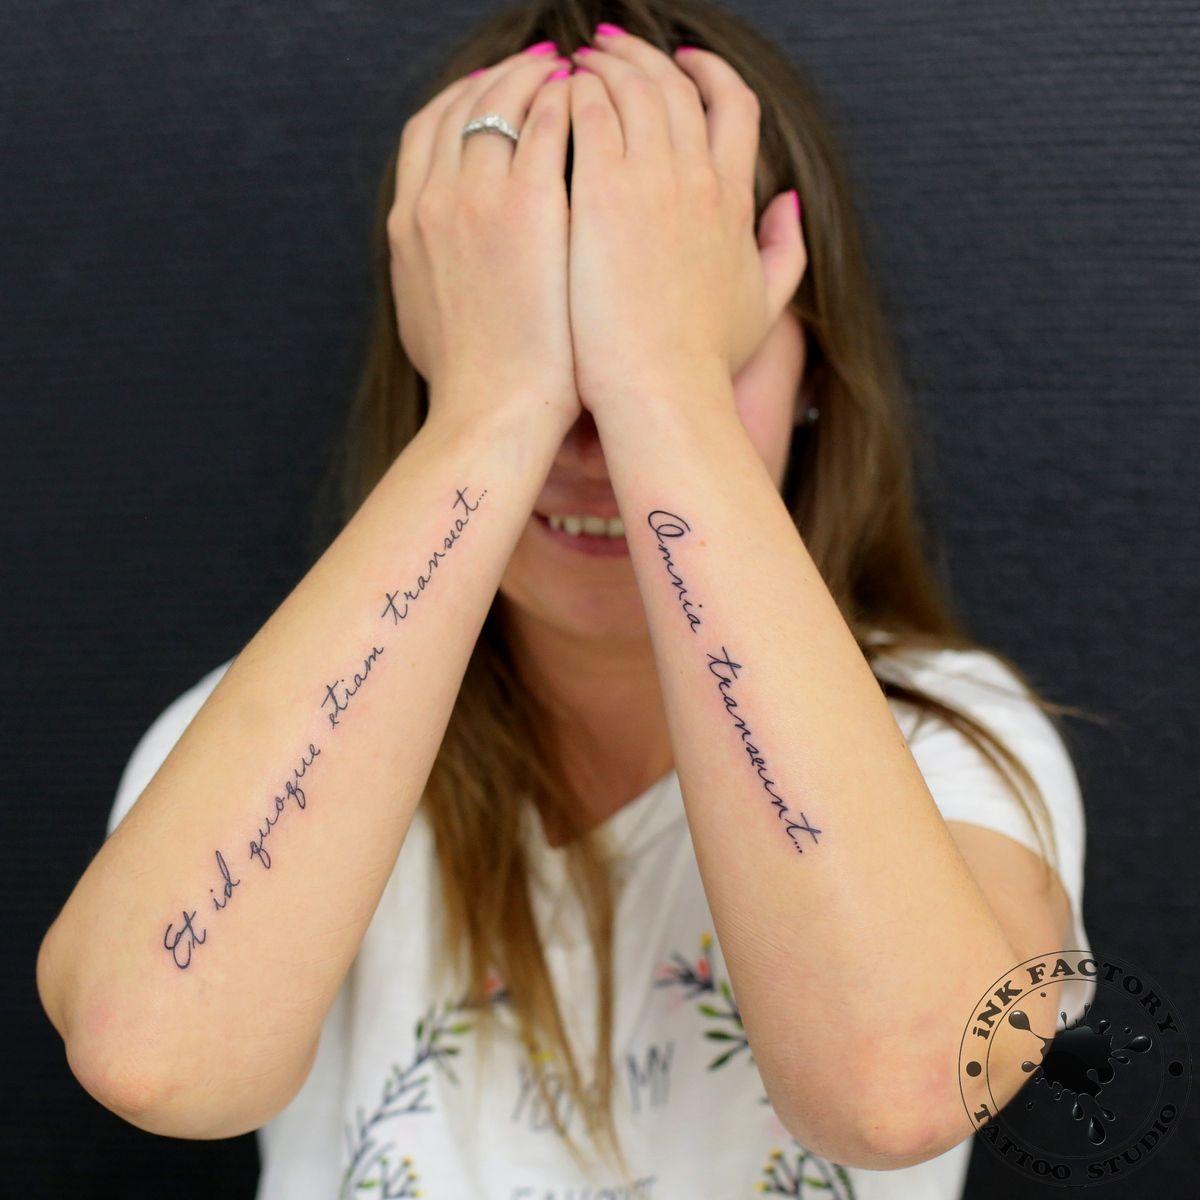 Надписи на руках